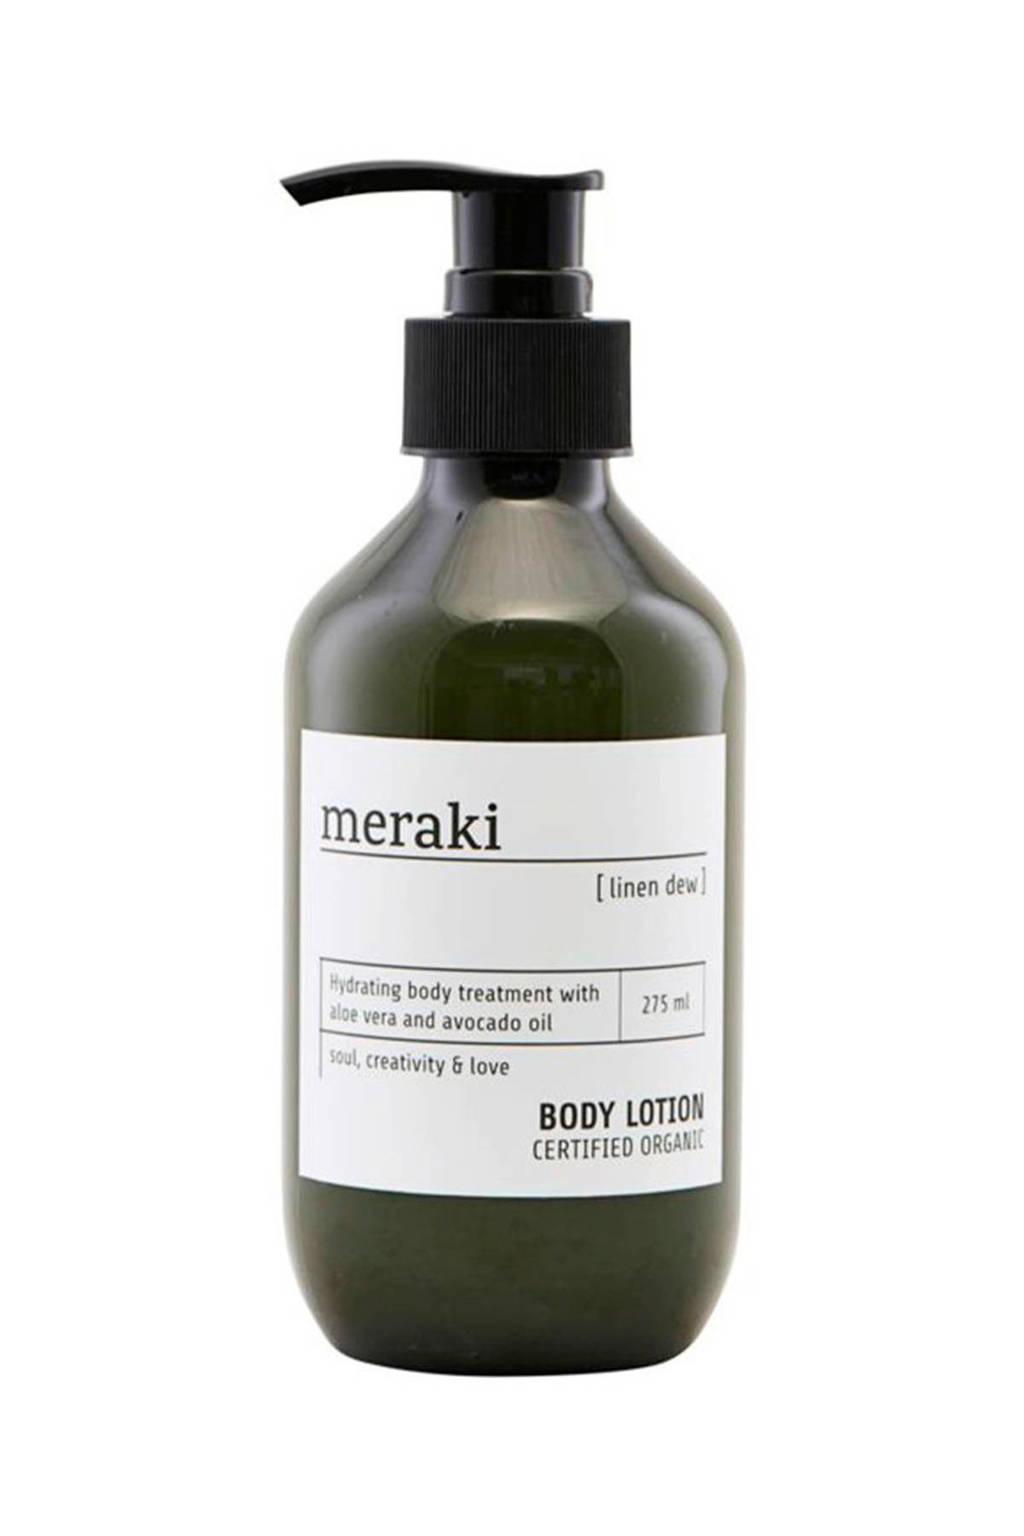 Meraki Linen Dew bodylotion - 300 ml